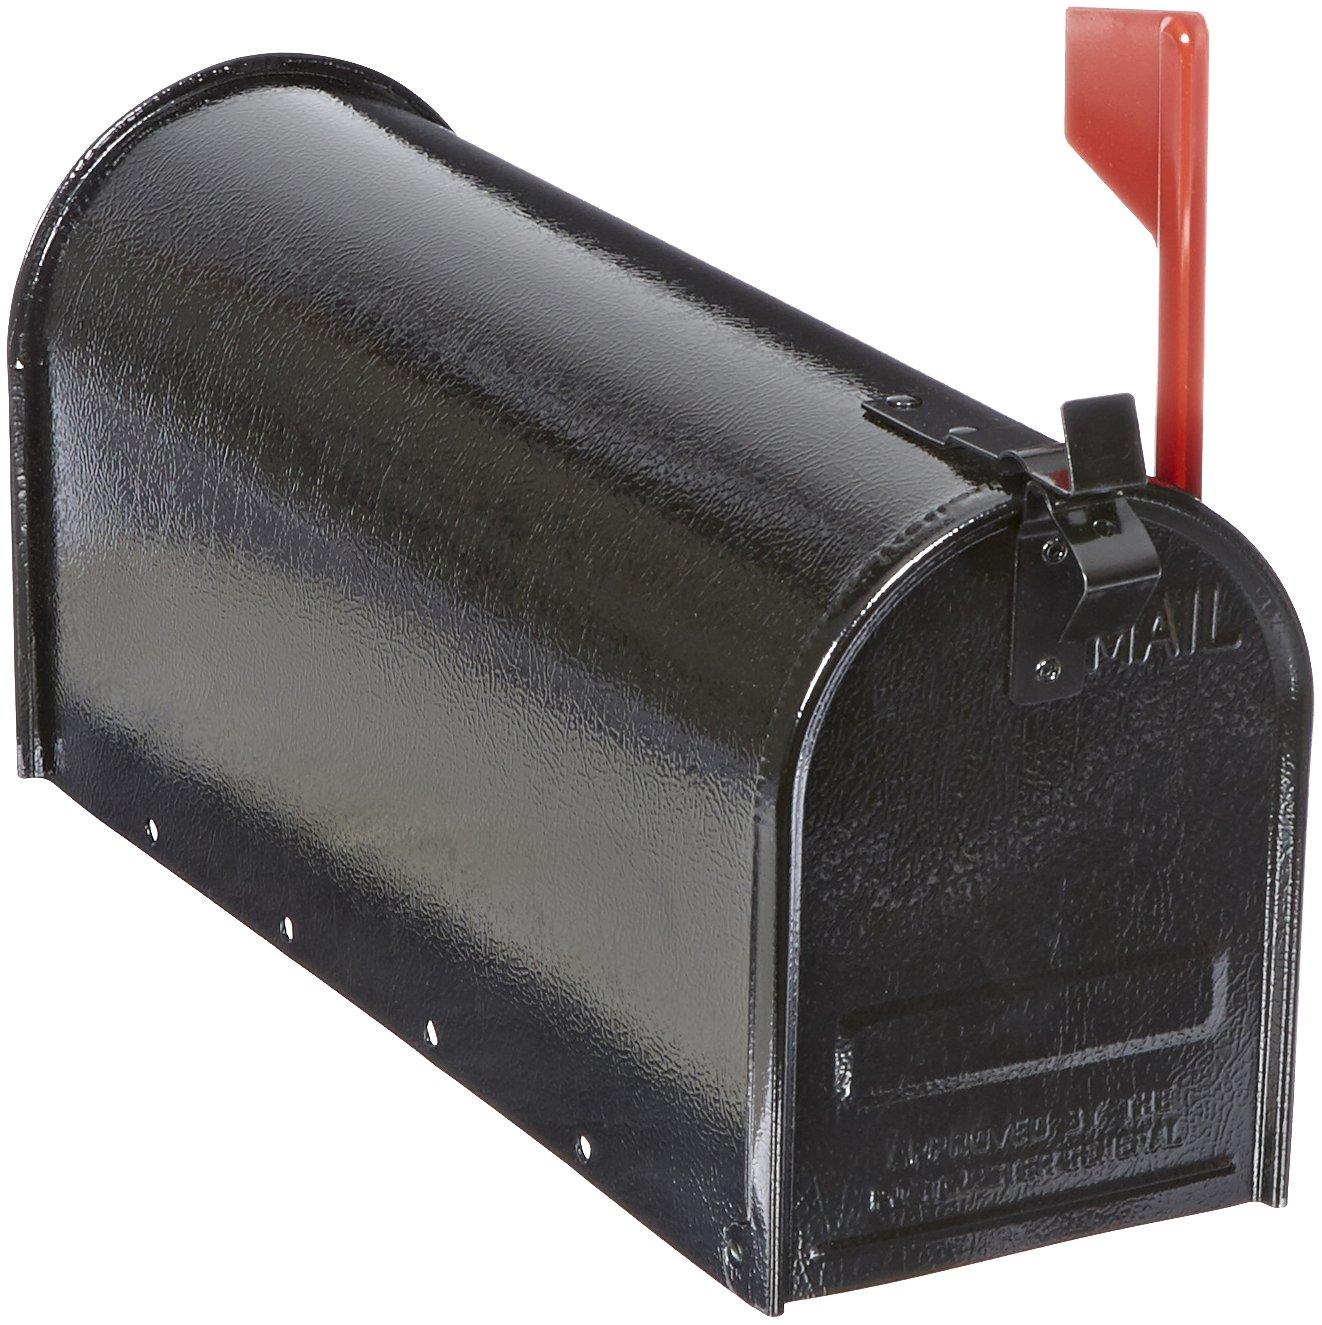 Tapco 034-00115 Steel Economy Mailbox, 19'' Length x 7'' Width x 9'' Height, Black